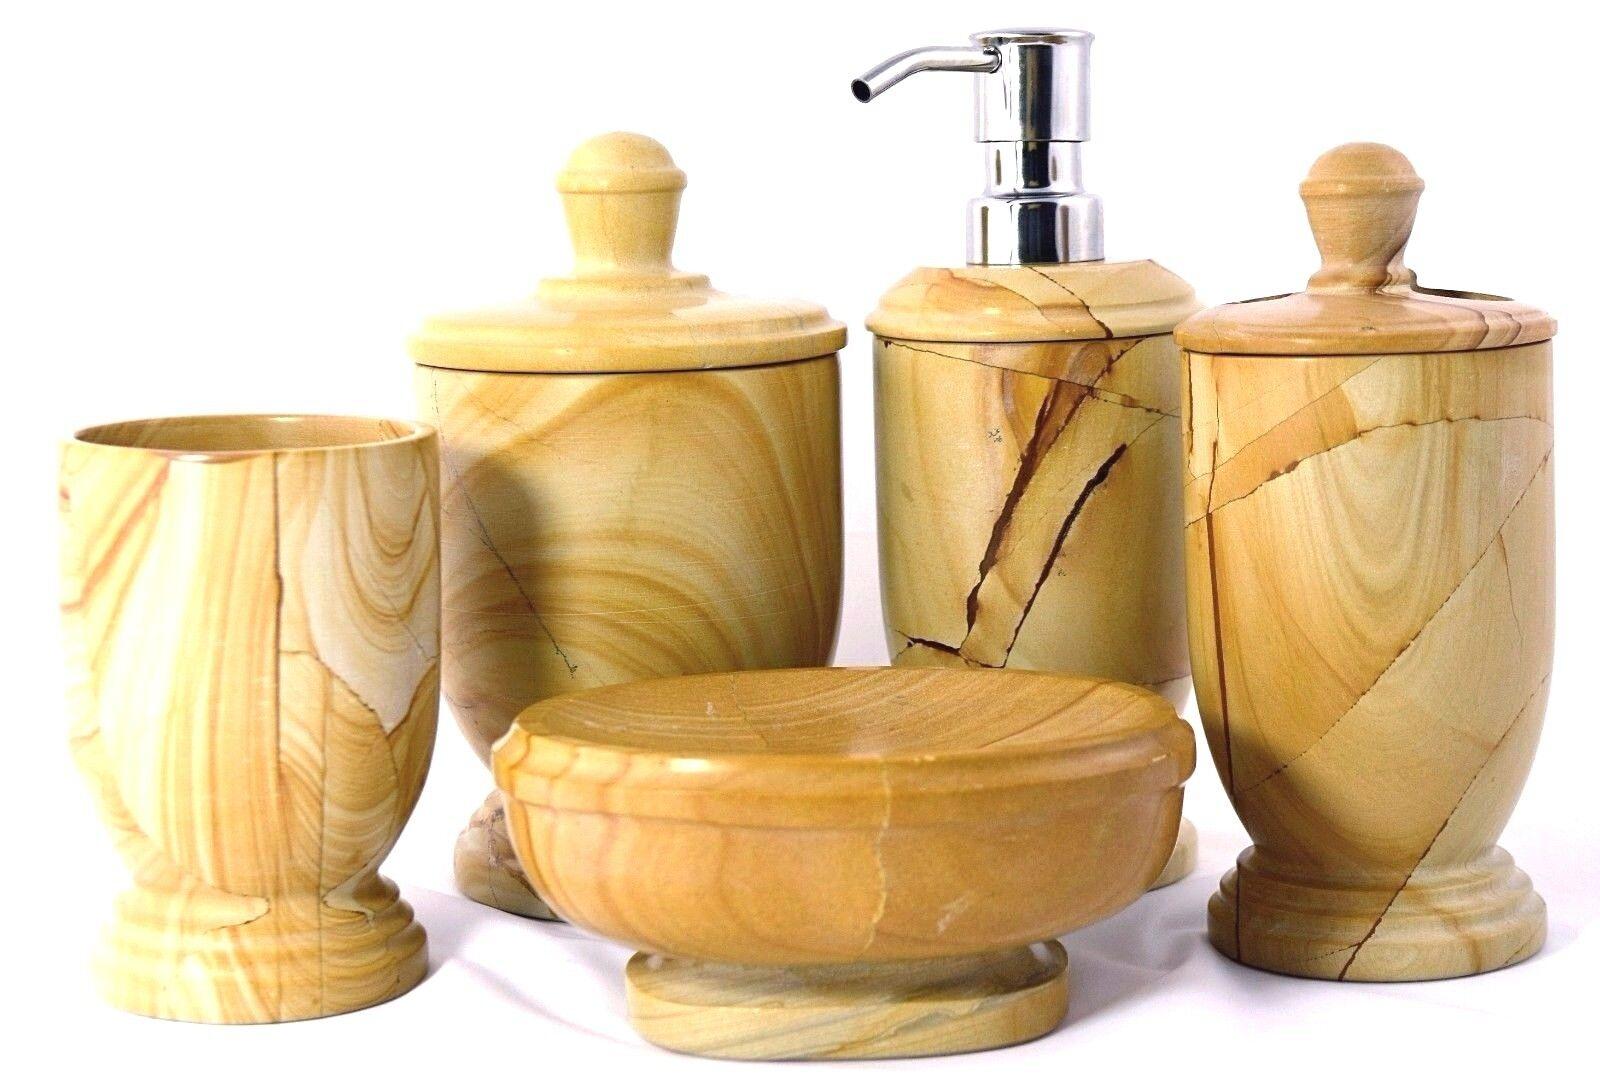 Multi Bathroom Accessory Set in Luxury Imported Beige Teakwood Marble